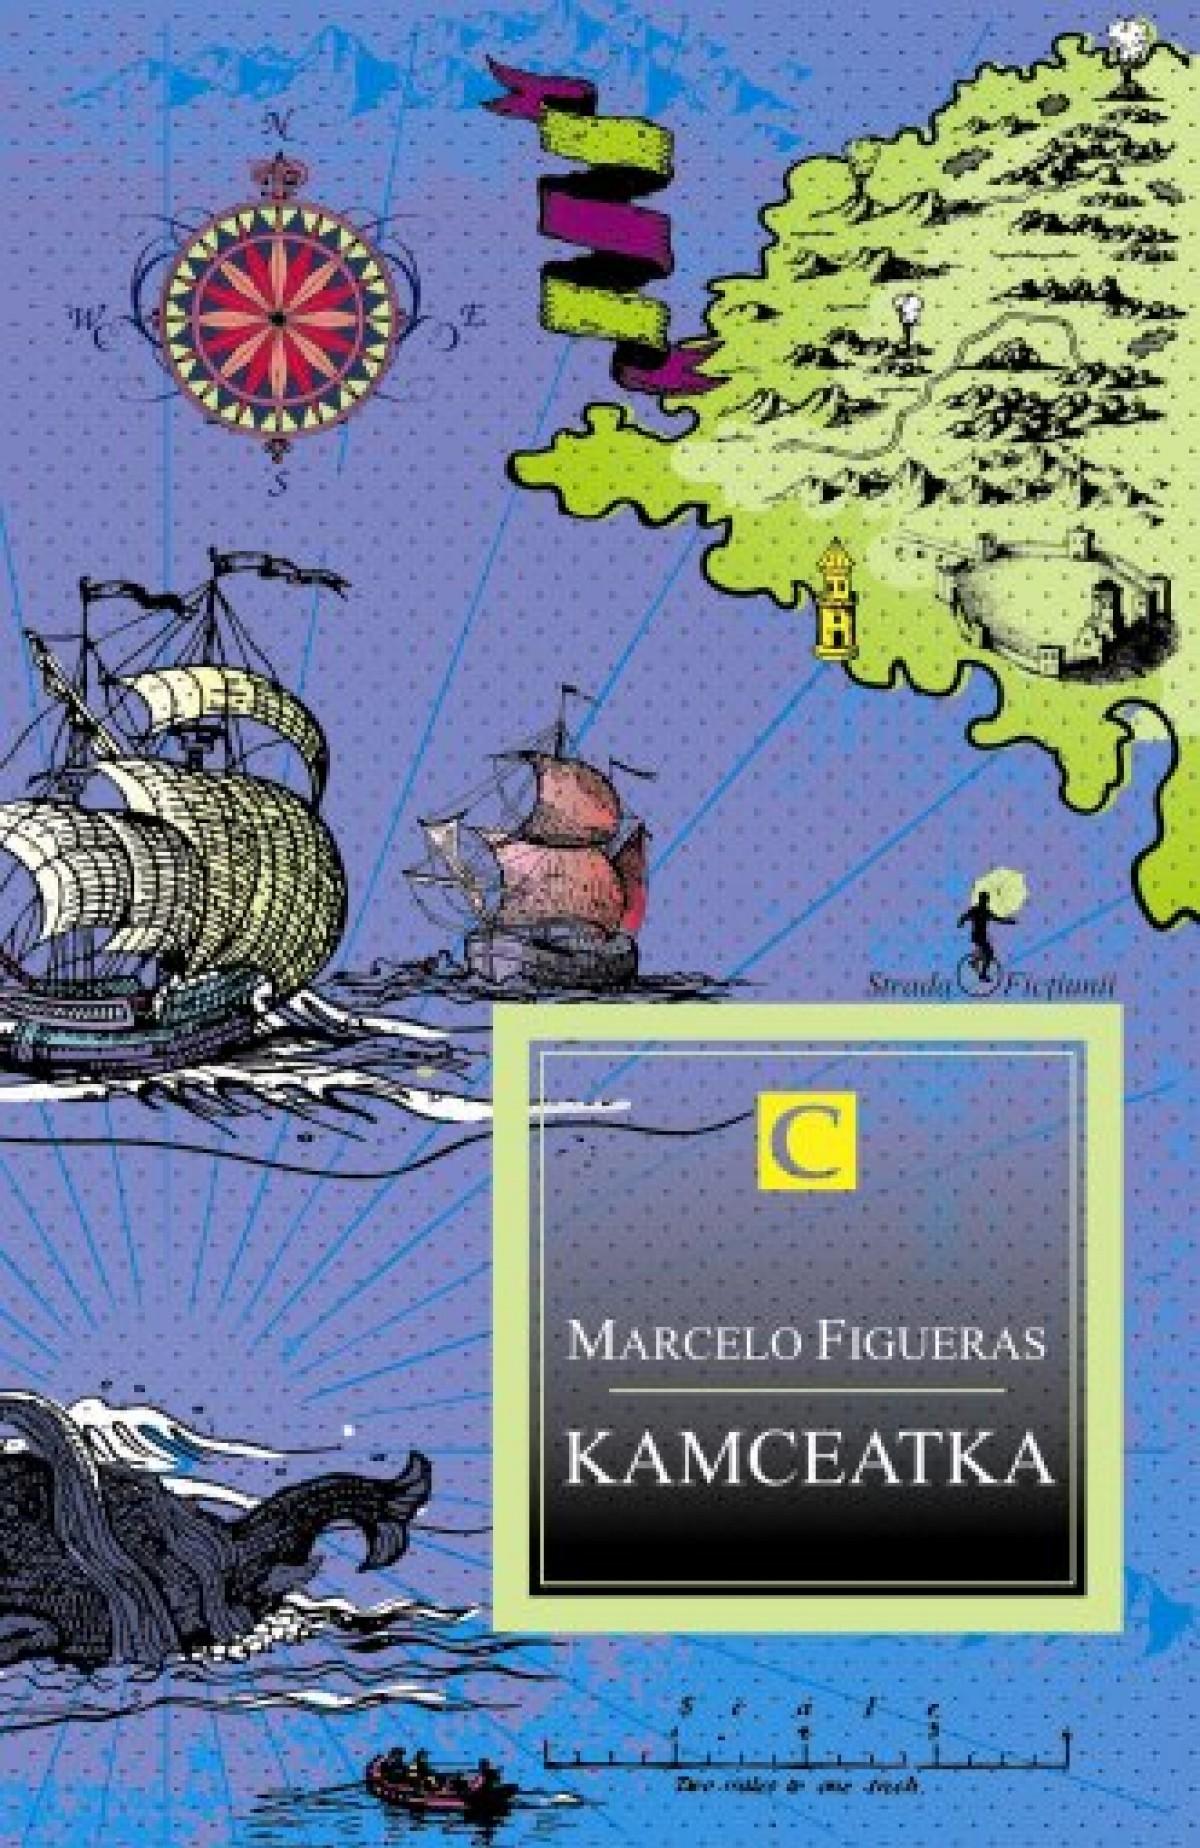 Kamceatka